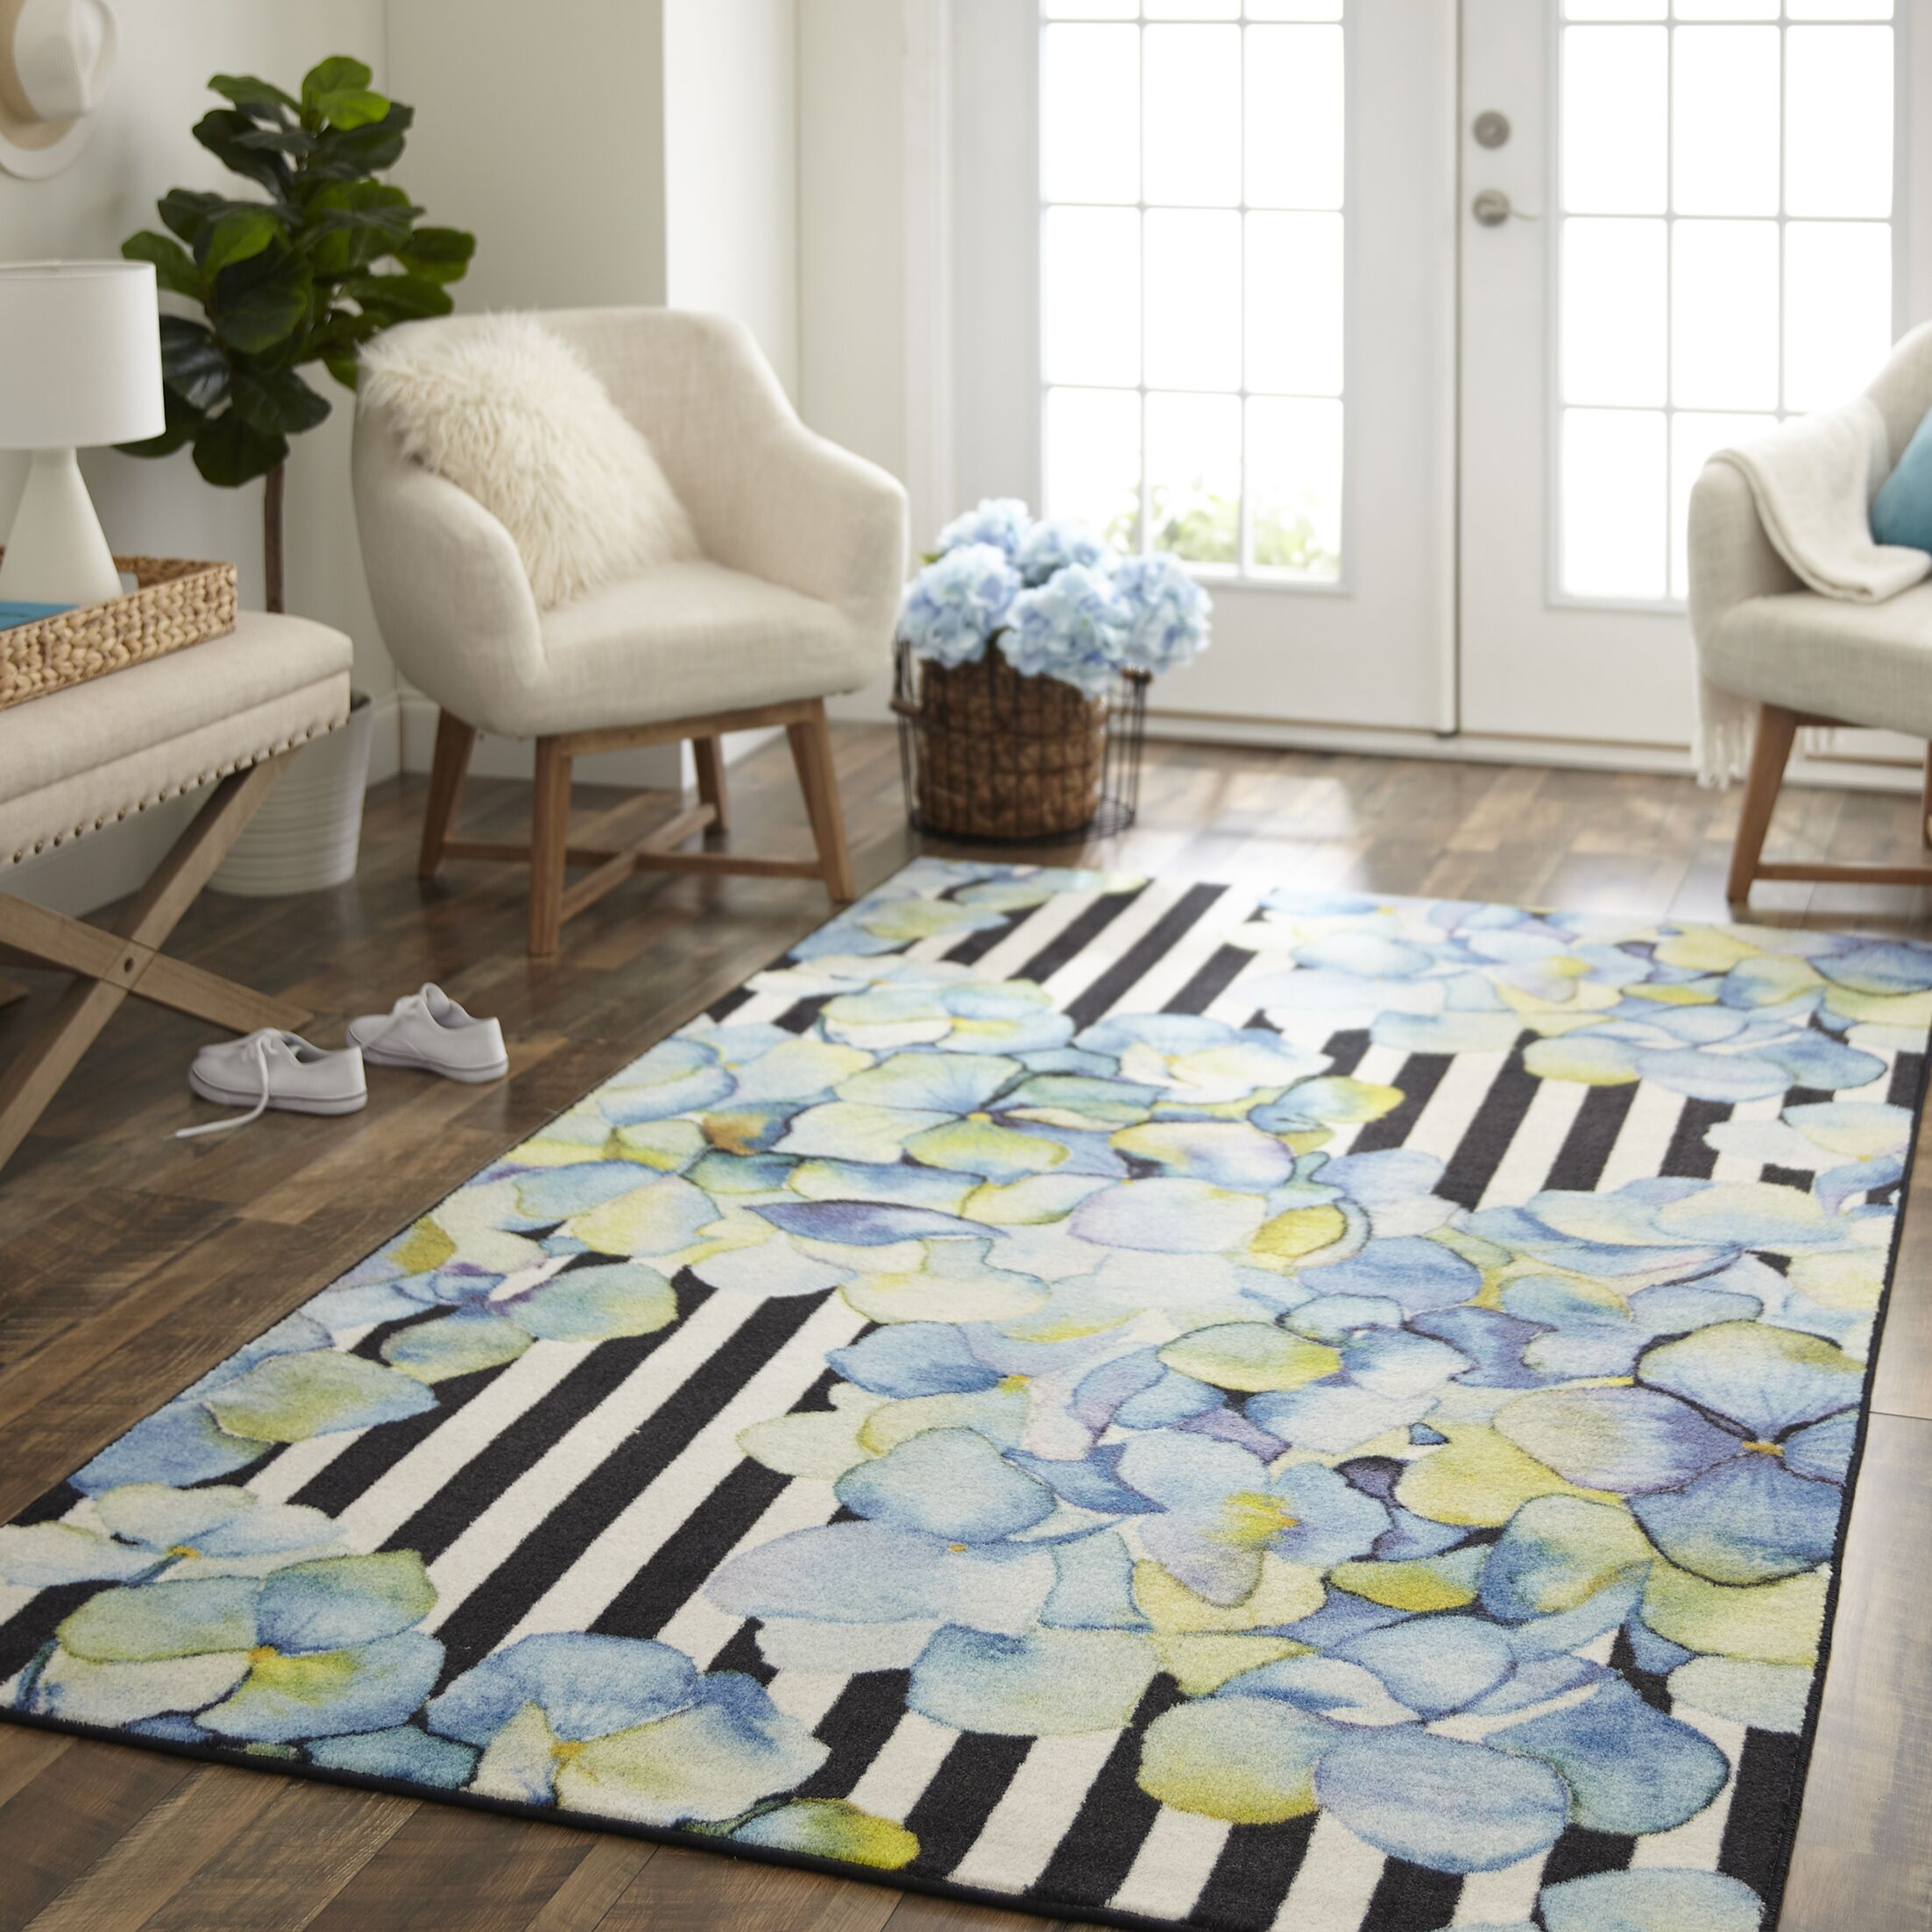 Venson Pattern Mix Blue/Black Area Rug Rug Size: Rectangle 5' x 8'